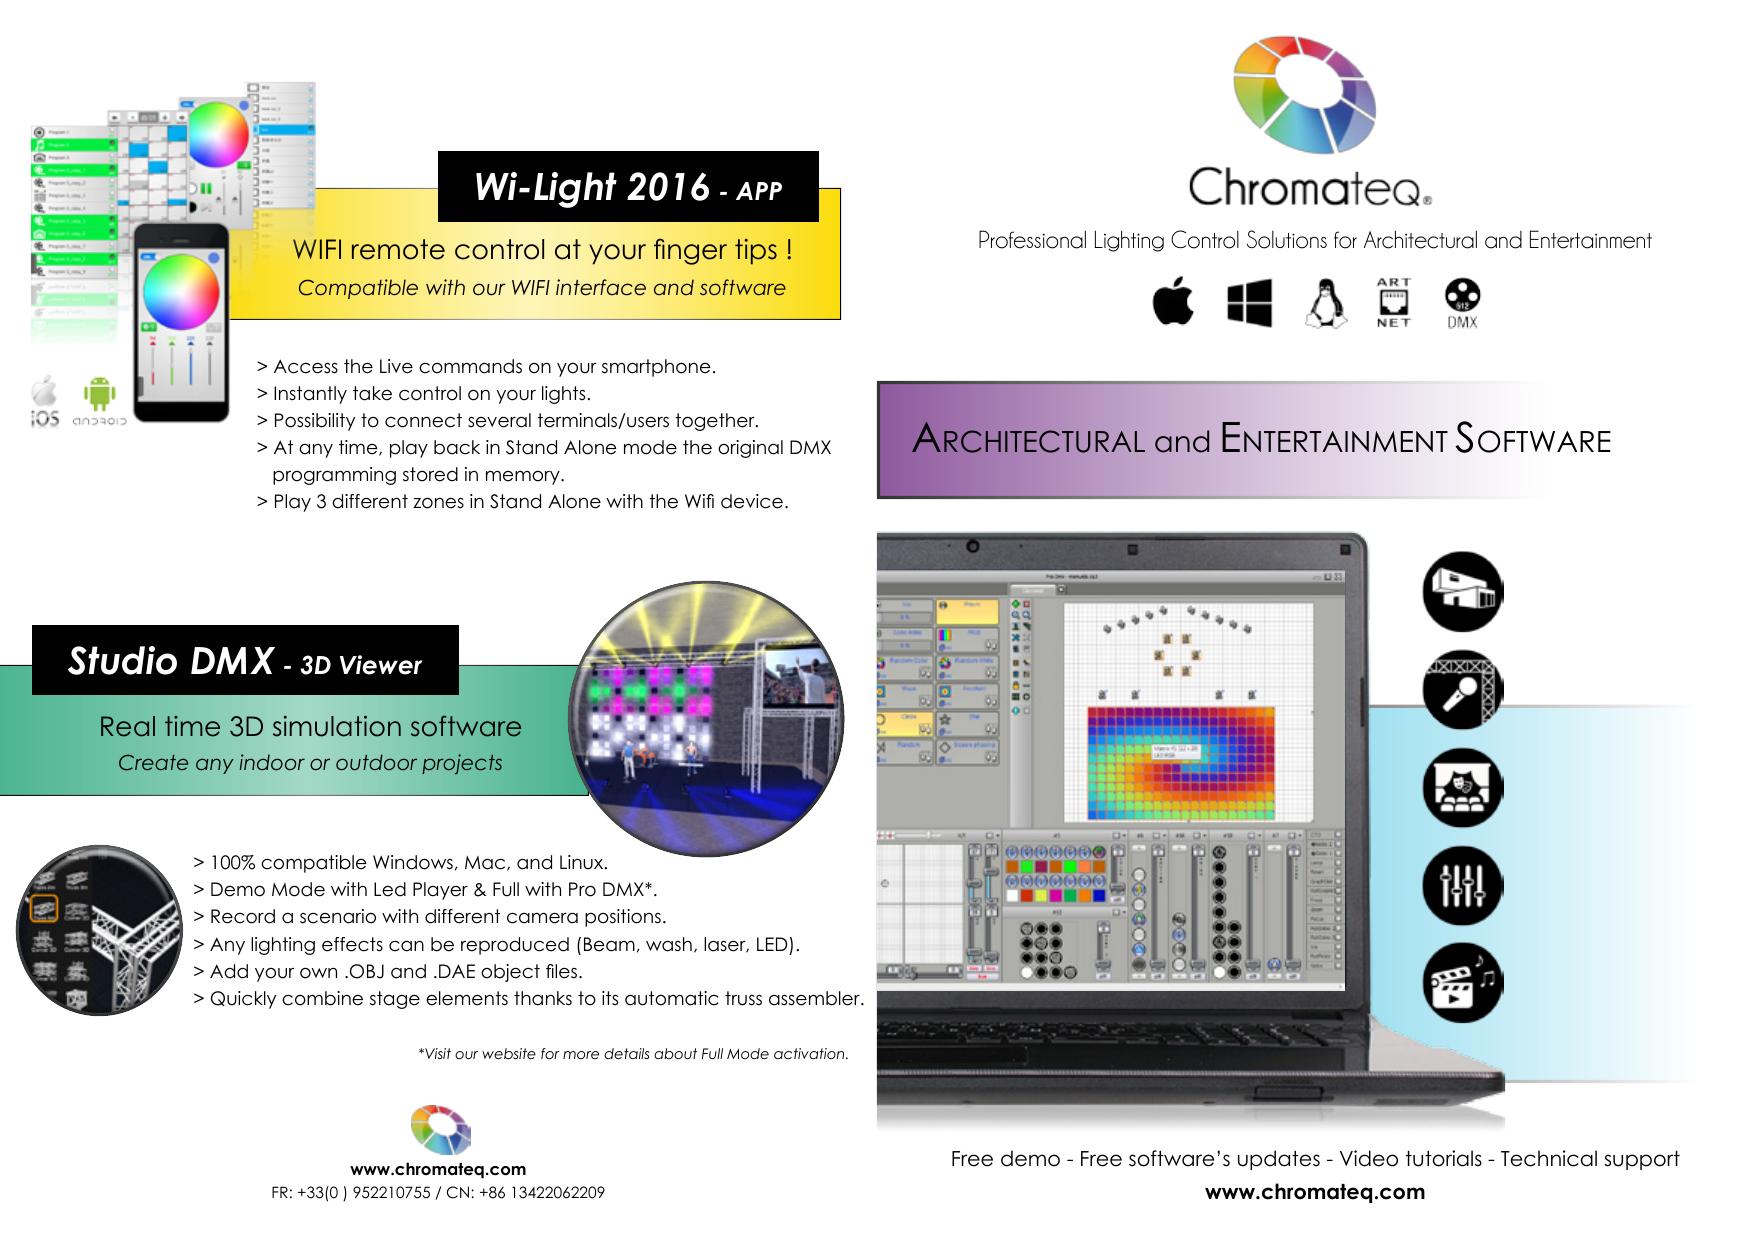 Wi-Light 2016 - APP Studio DMX | manualzz com